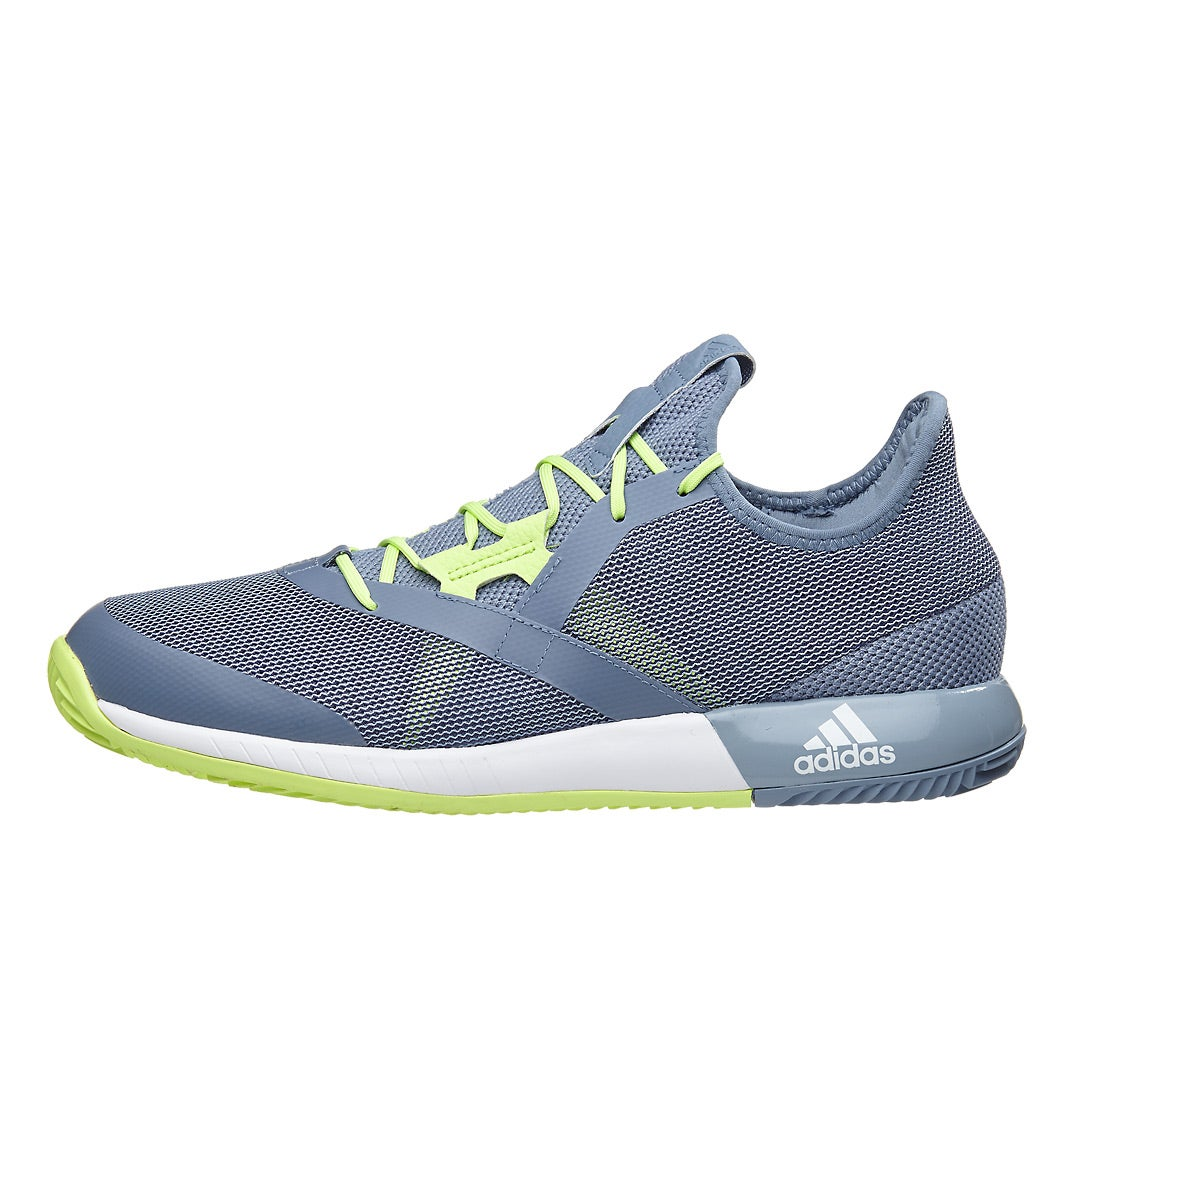 adidas adizero Defiant Bounce Grey/Yellow Men's Shoes 360